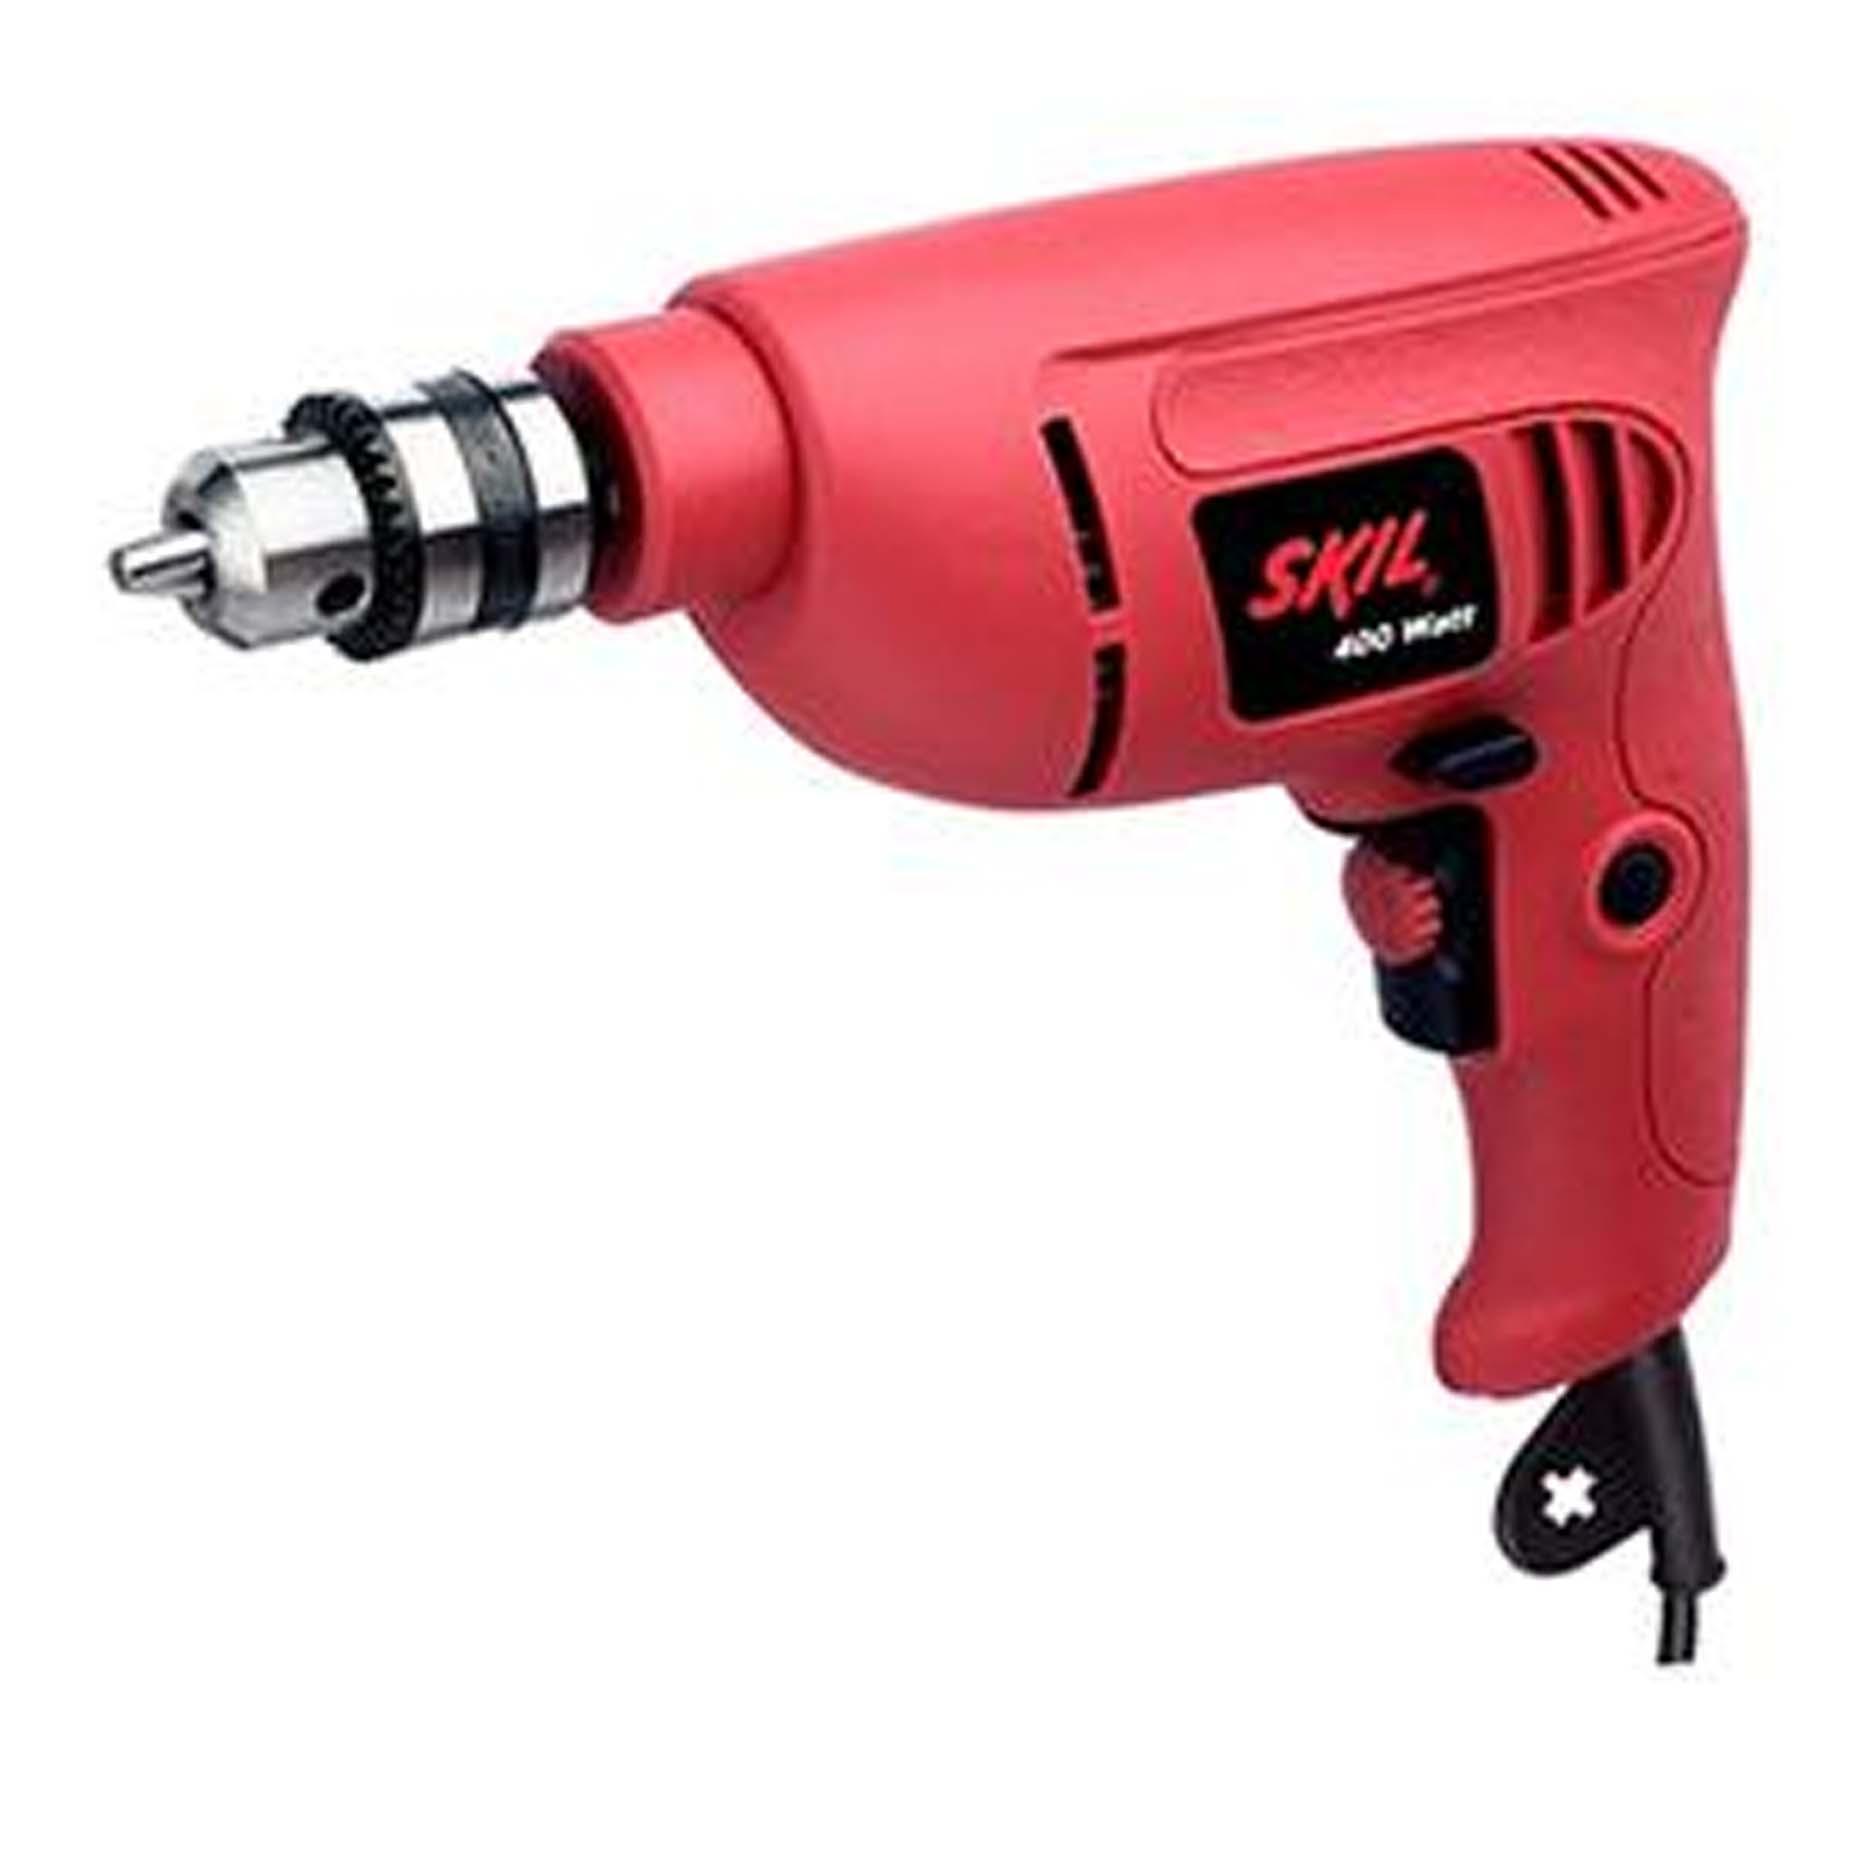 Harga Skil Drill 6535 Bor 10mm Merah Hand Pipe Bender Krisbow 3 8 7 8in Kw1500520 Info Lainnya